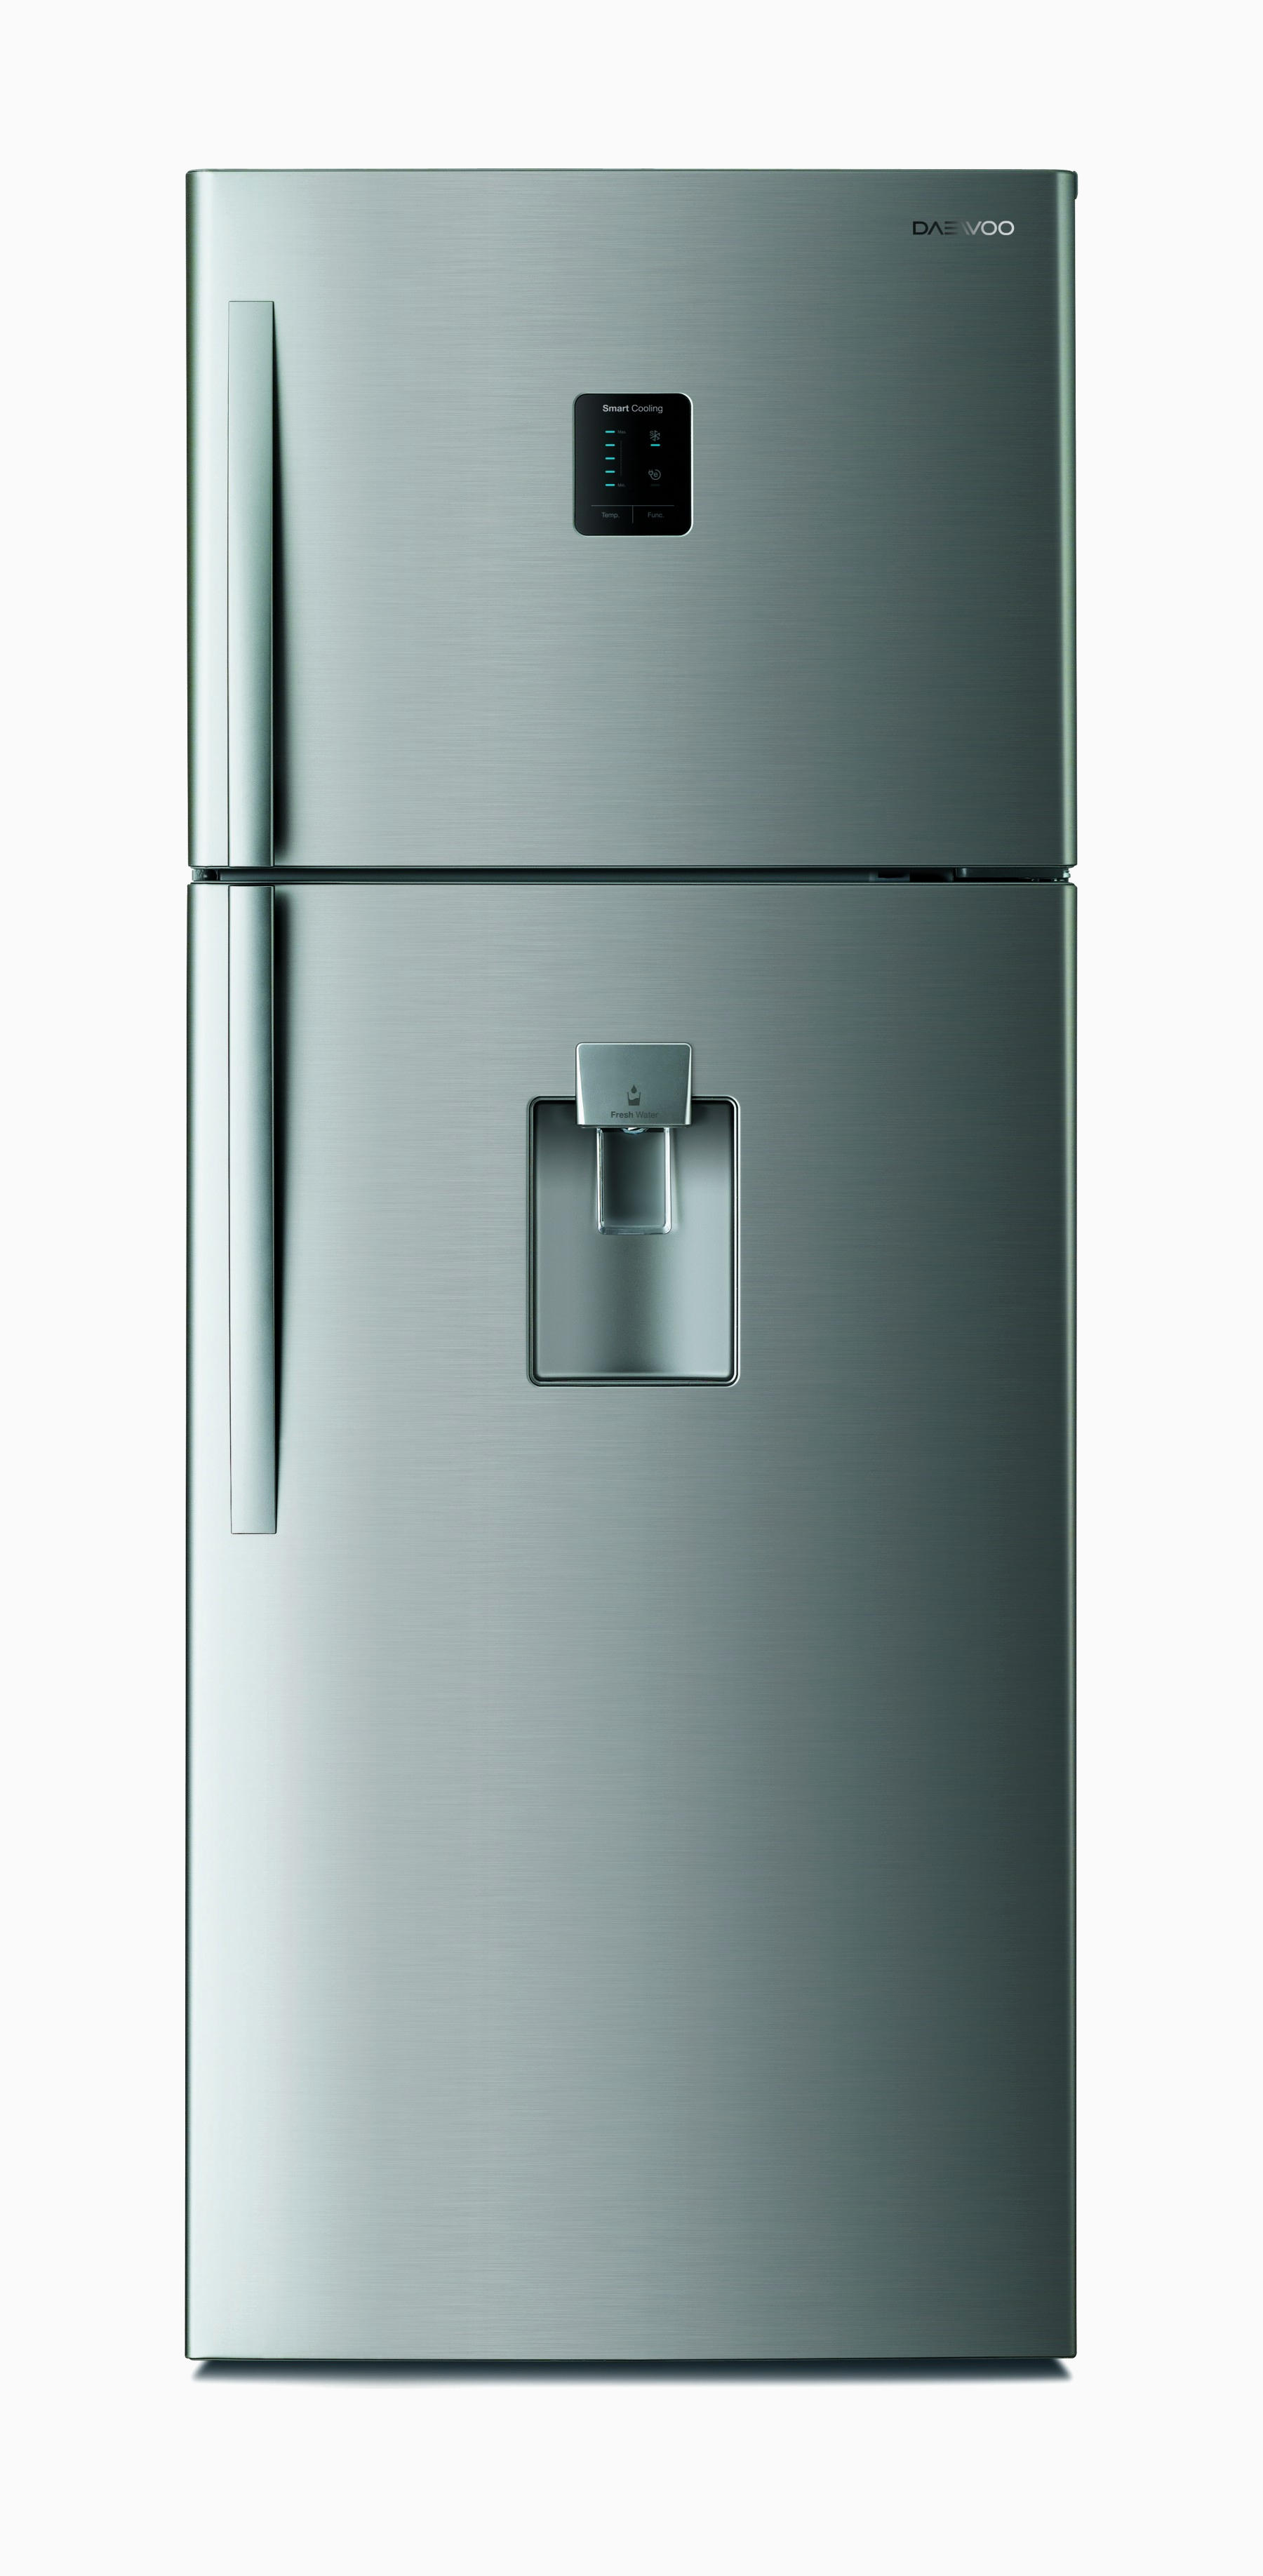 frigo americain miroir darty l 39 electronique la maison. Black Bedroom Furniture Sets. Home Design Ideas